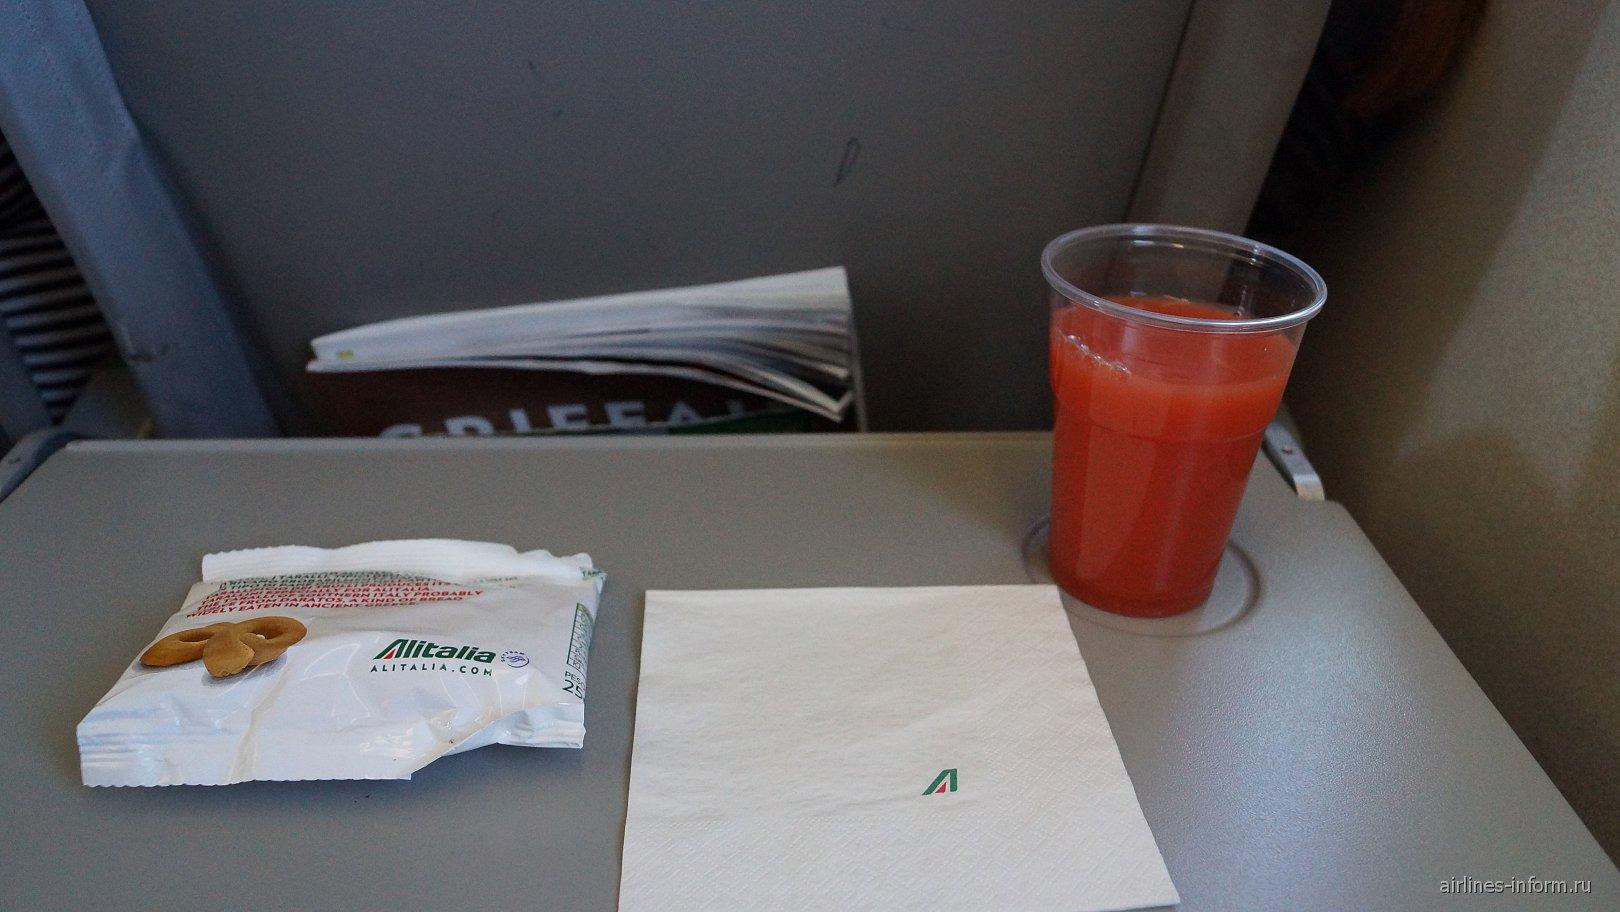 Снеки и сок для пассажиров на рейсе Бари-Рим авиакомпании Alitalia